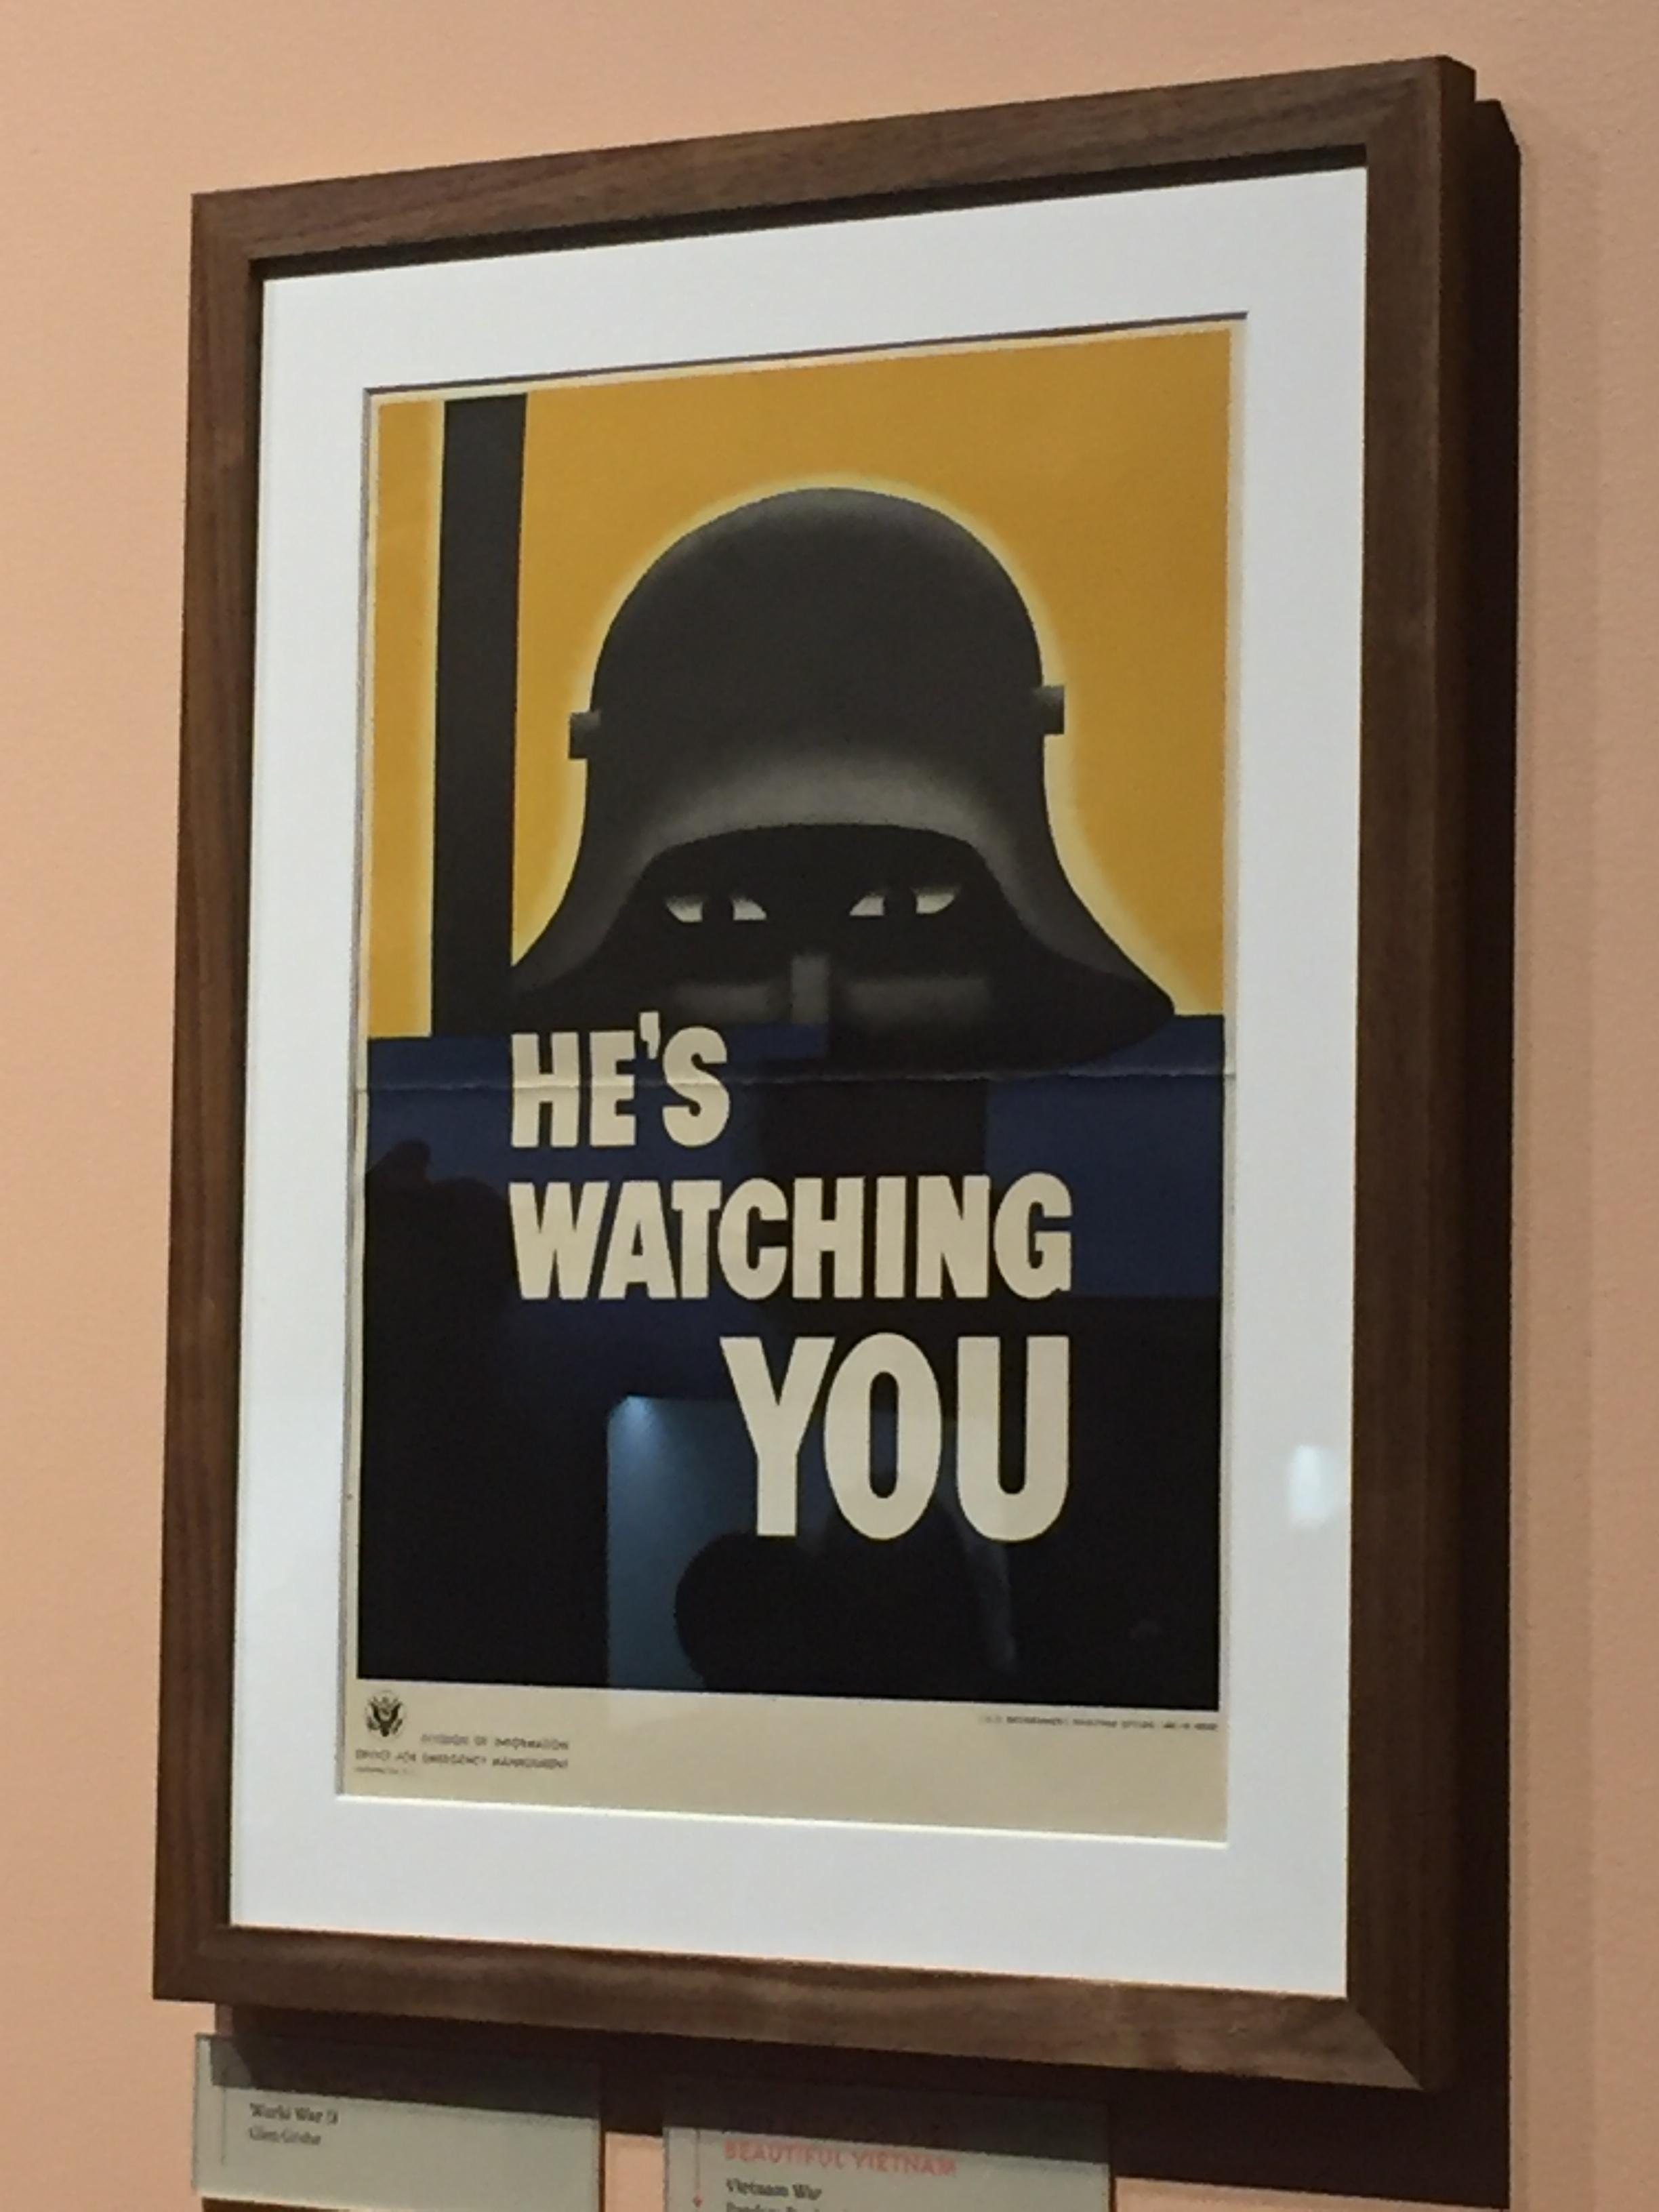 causes of war propaganda posters (4).JPG